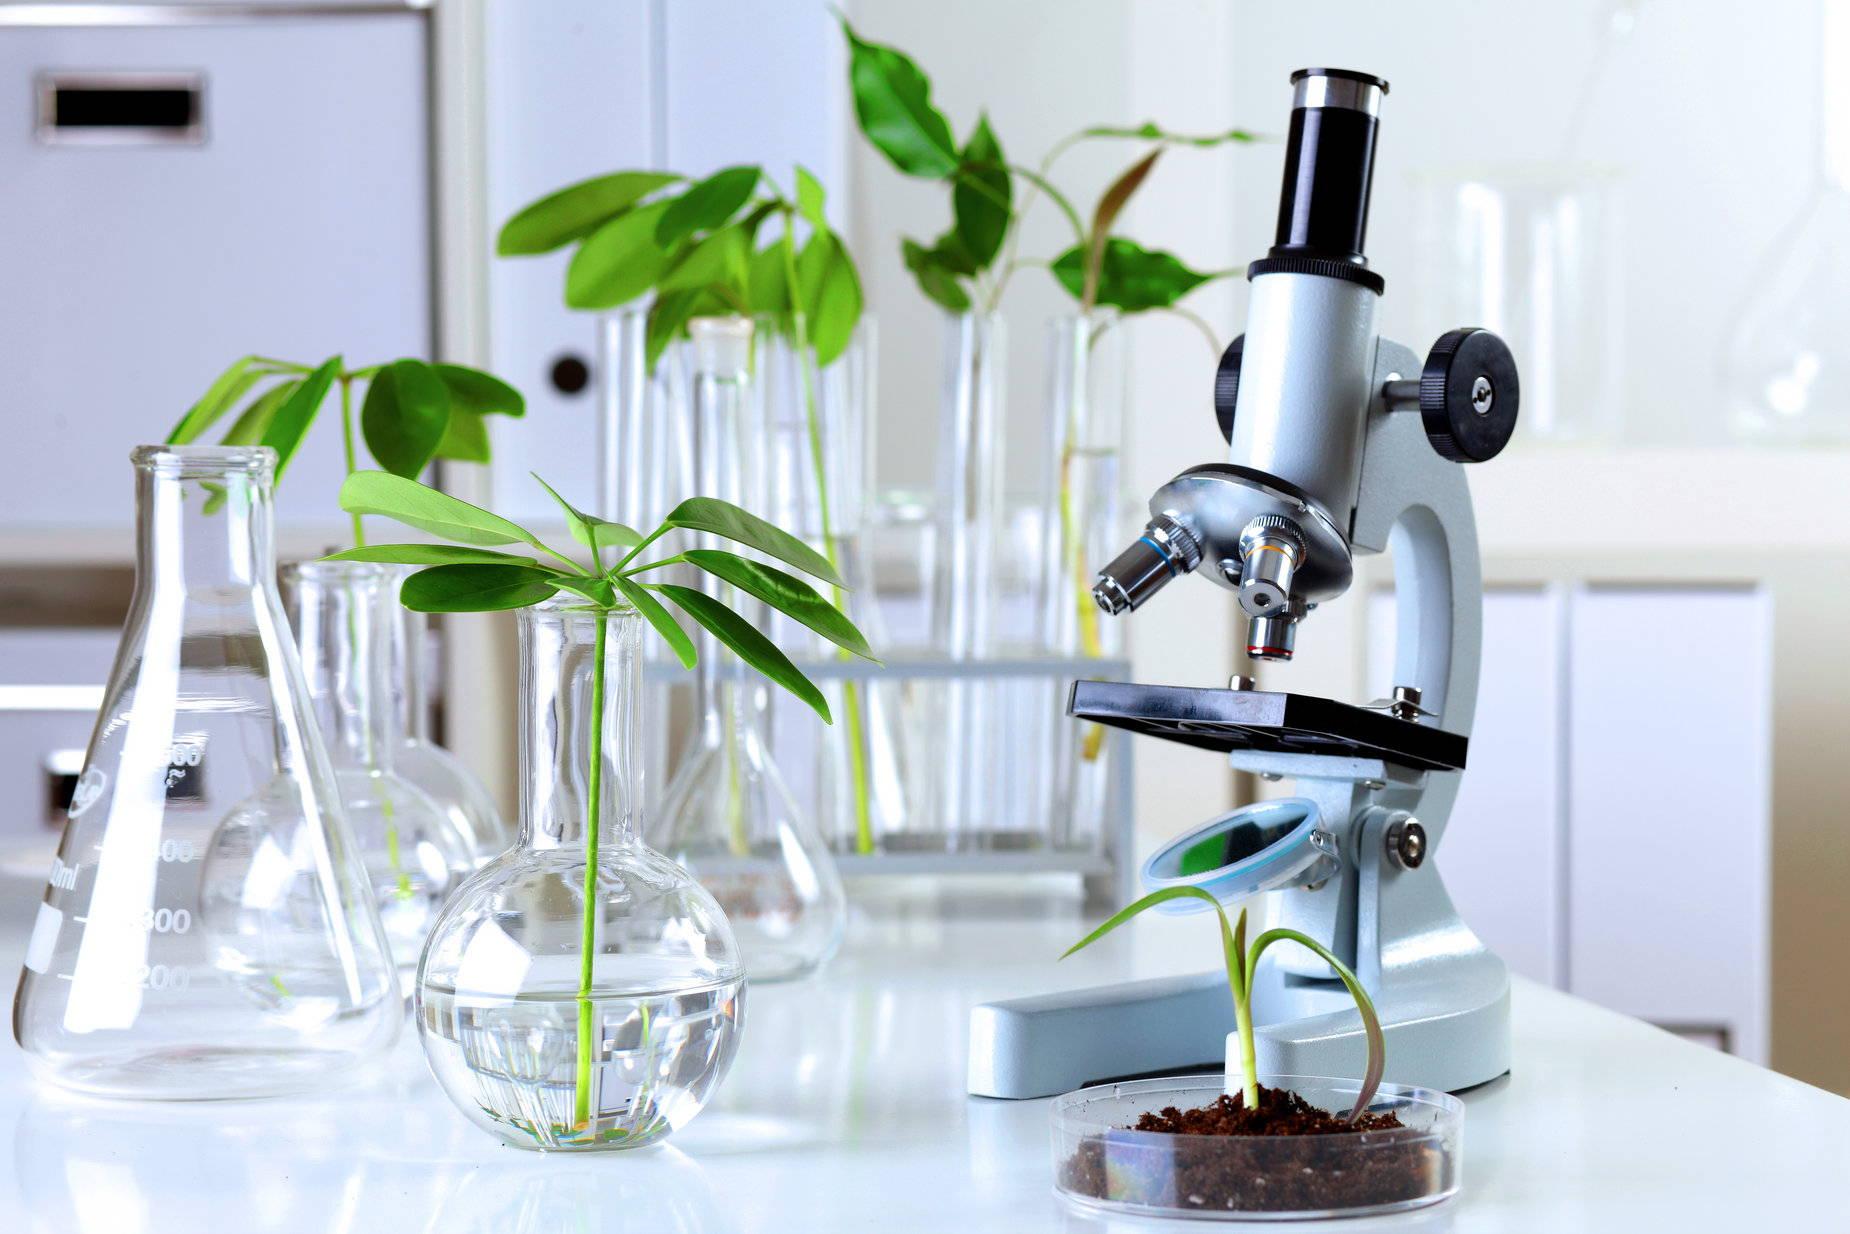 Картинки лаборатория биологии